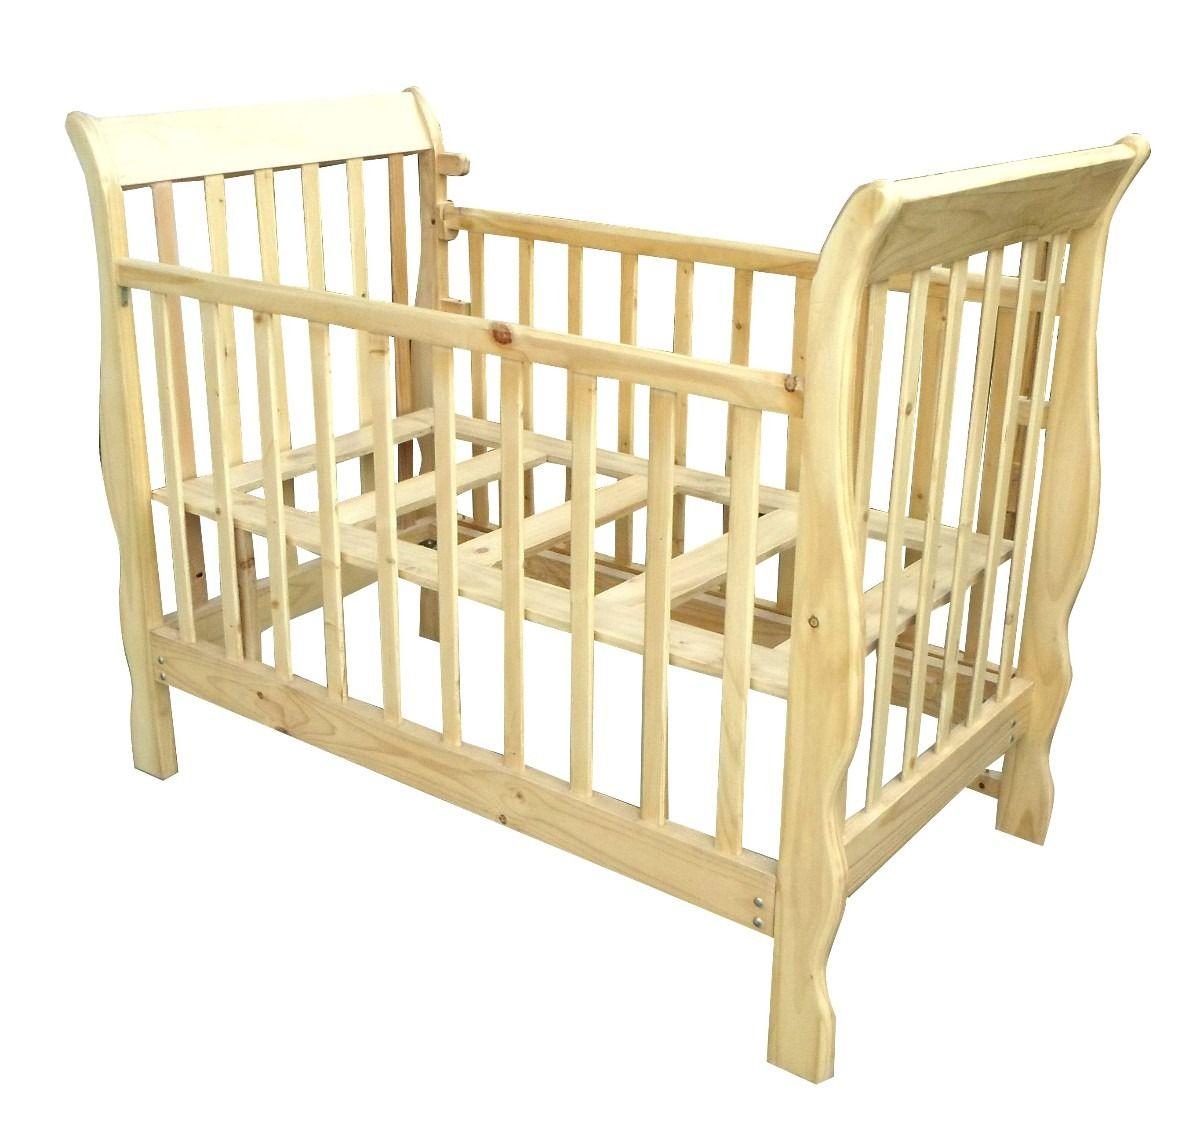 cuna para bebe en madera pino | Ideas para el hogar | Pinterest | Room